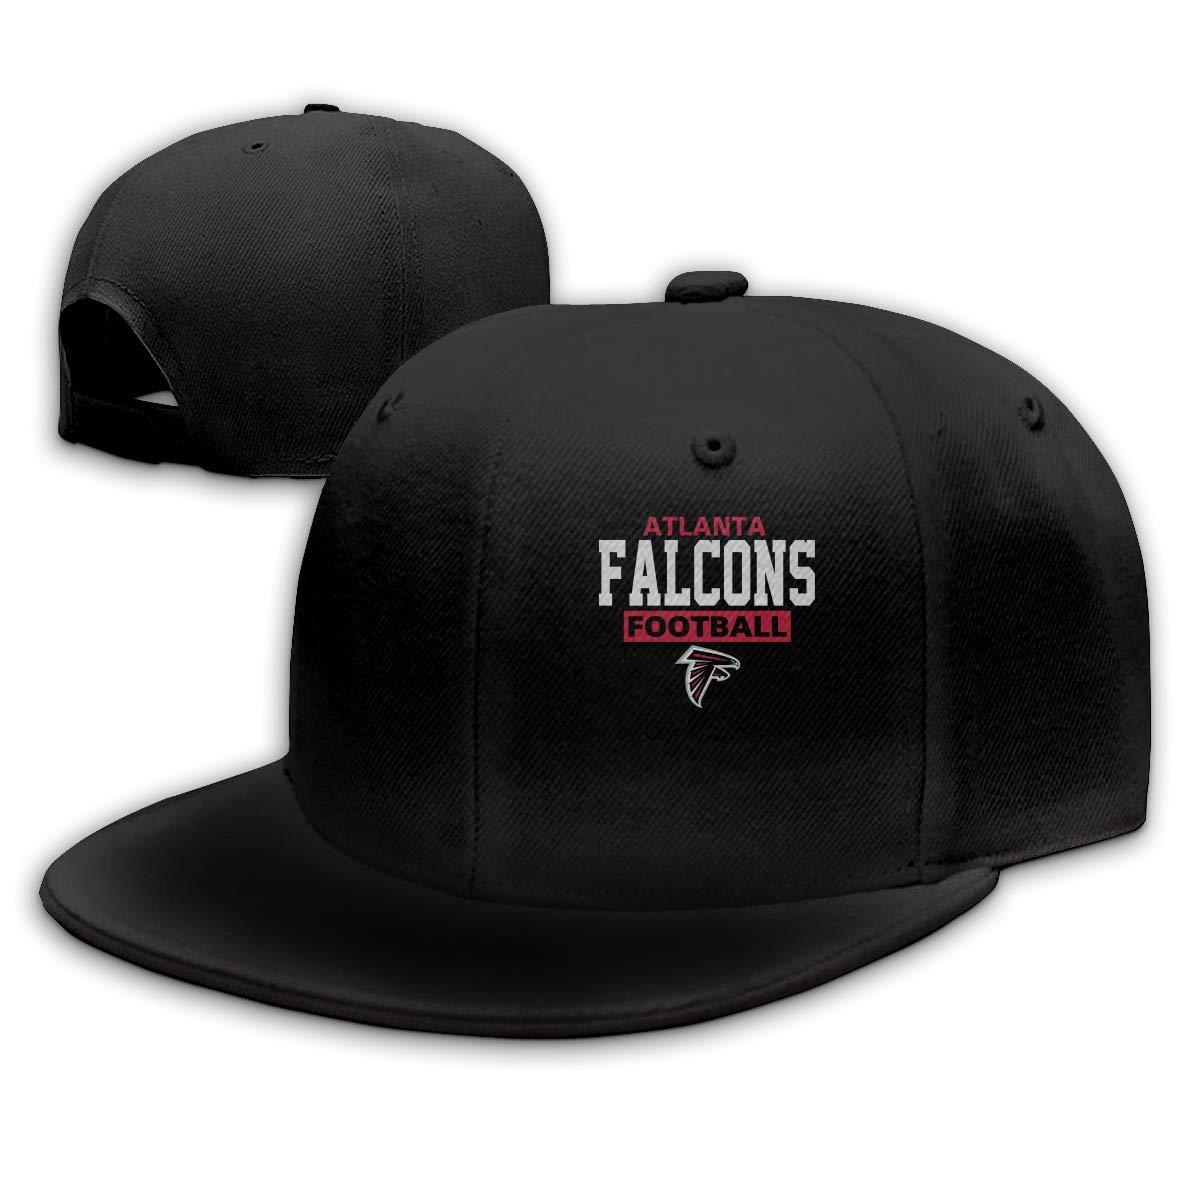 0b28a32e Unisex Men's-Atlanta-Falcons-Black-Field Style Dad Trucker Hat: Amazon.ca:  Sports & Outdoors